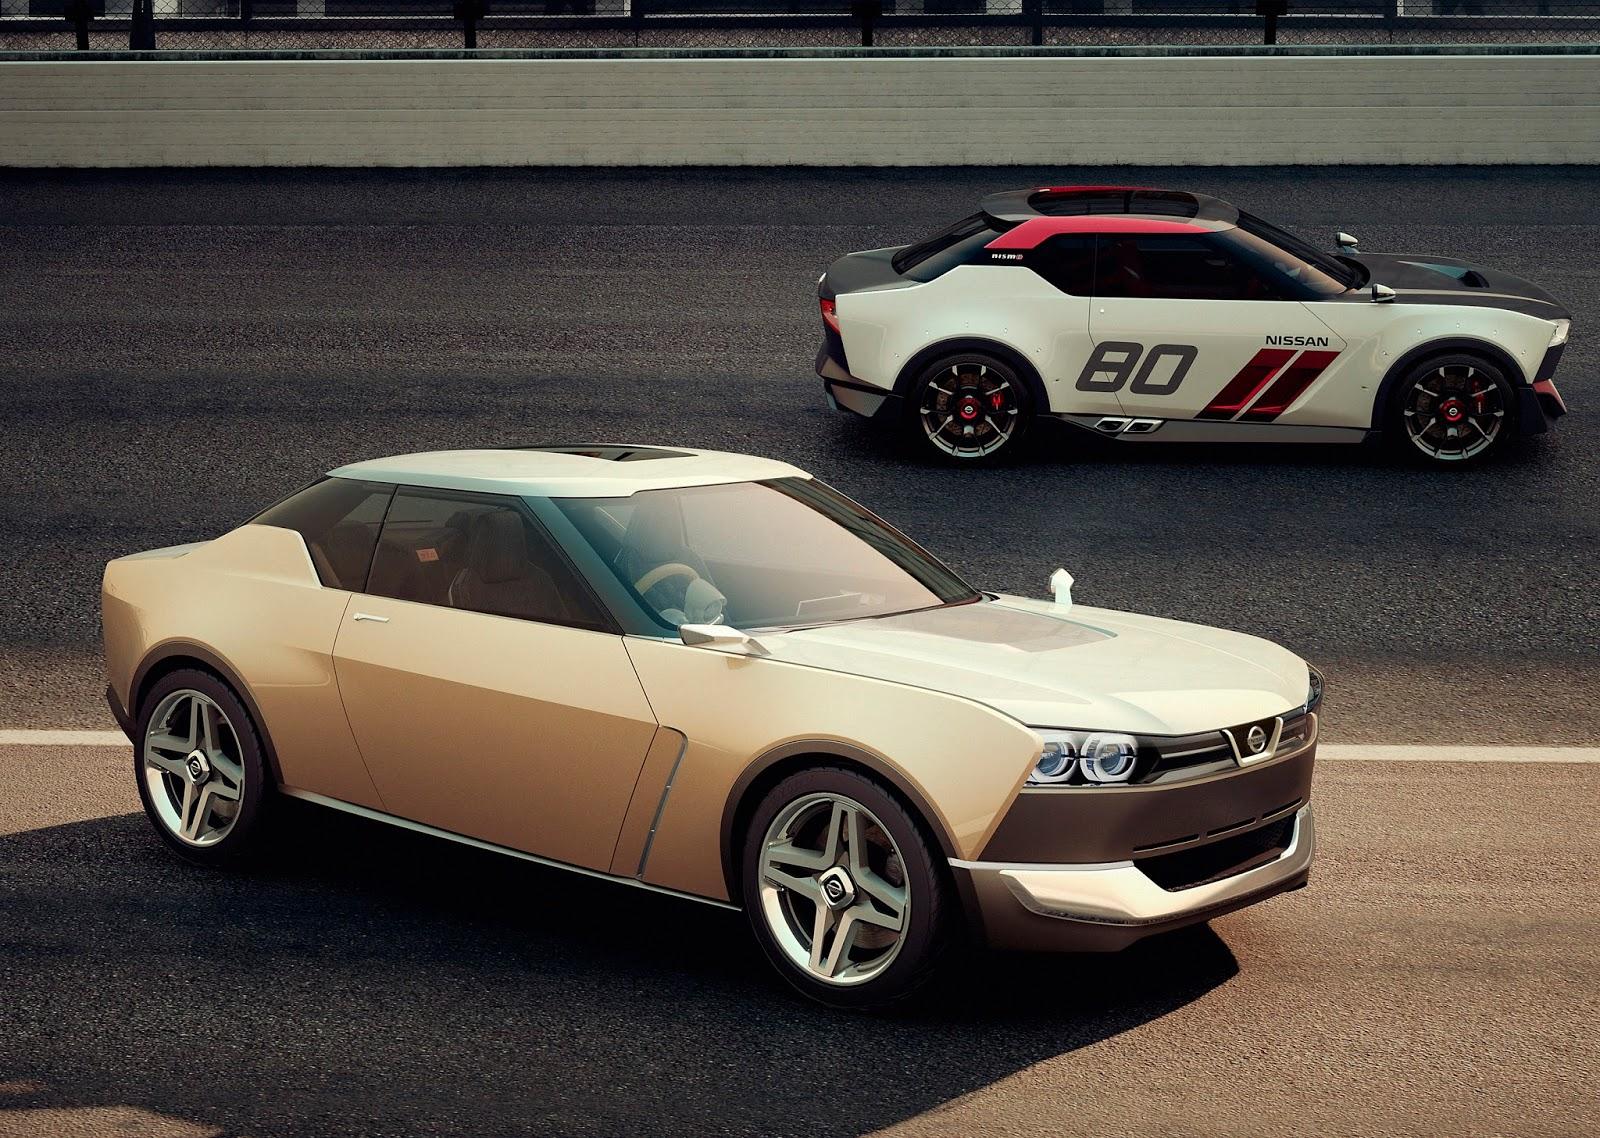 nissan concept Νέο σύστημα σχεδιασμού αυτοκινήτων απο την Nissan